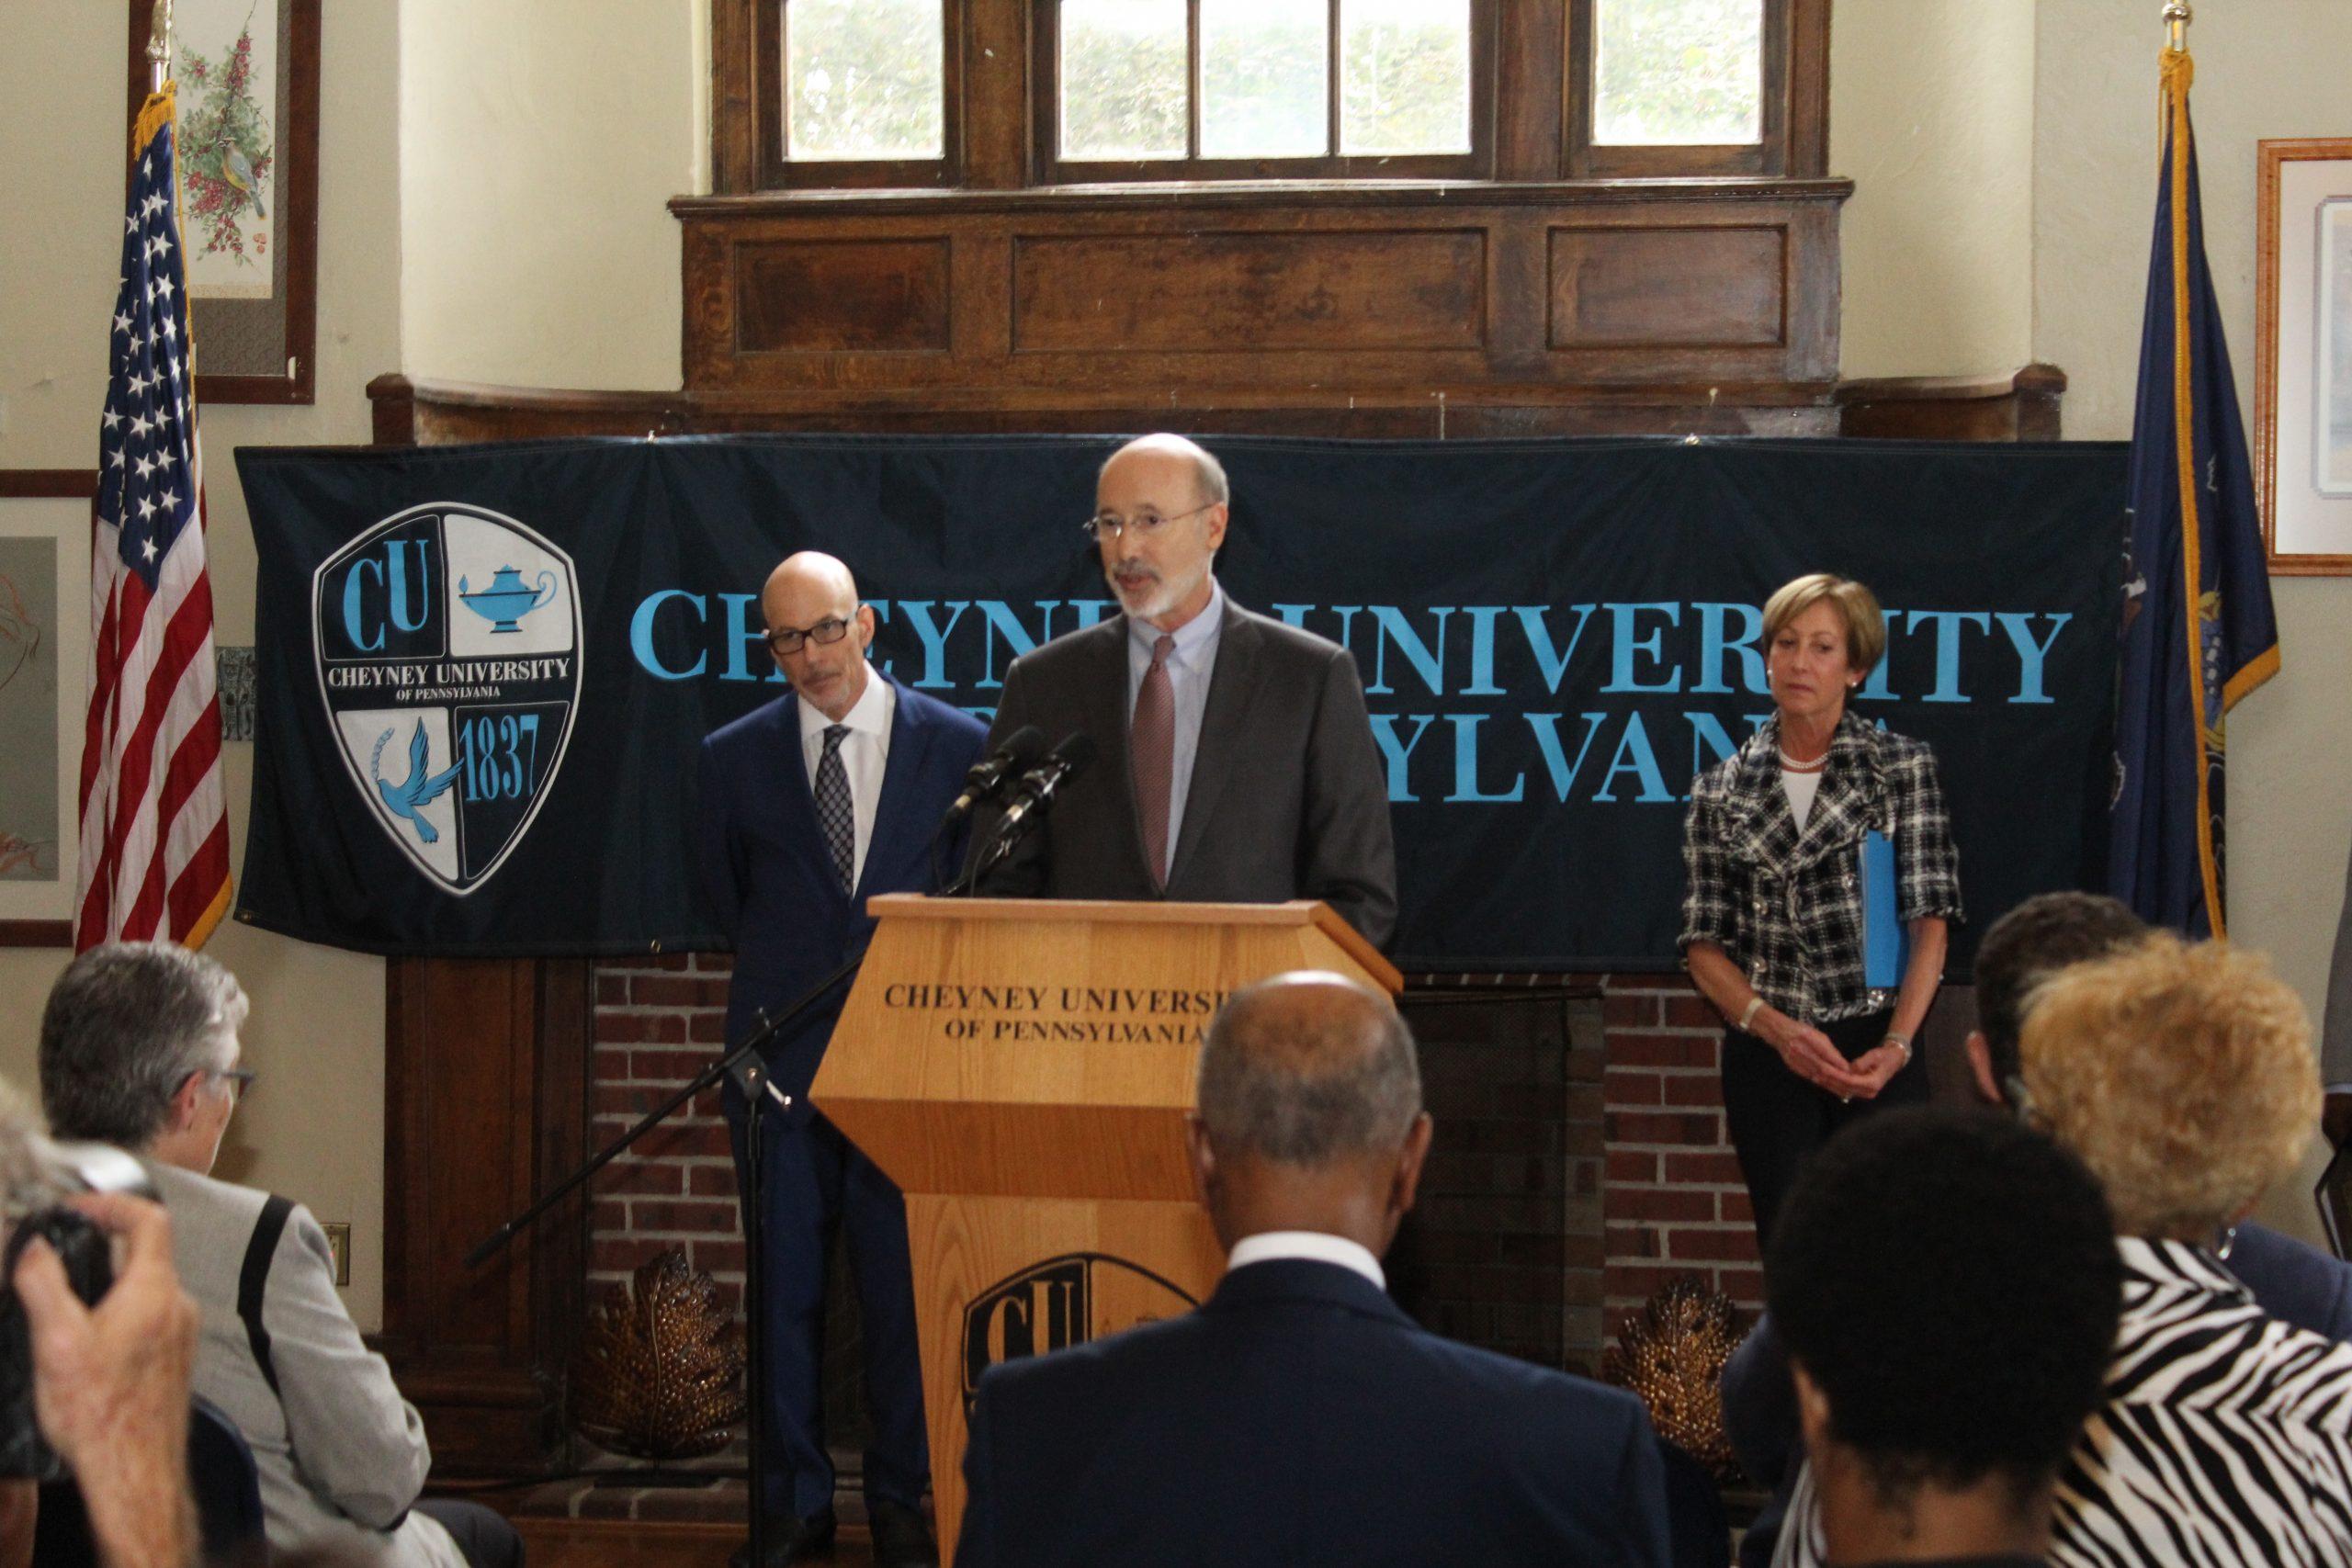 Cheyney University Announces Innovative New Partnerships